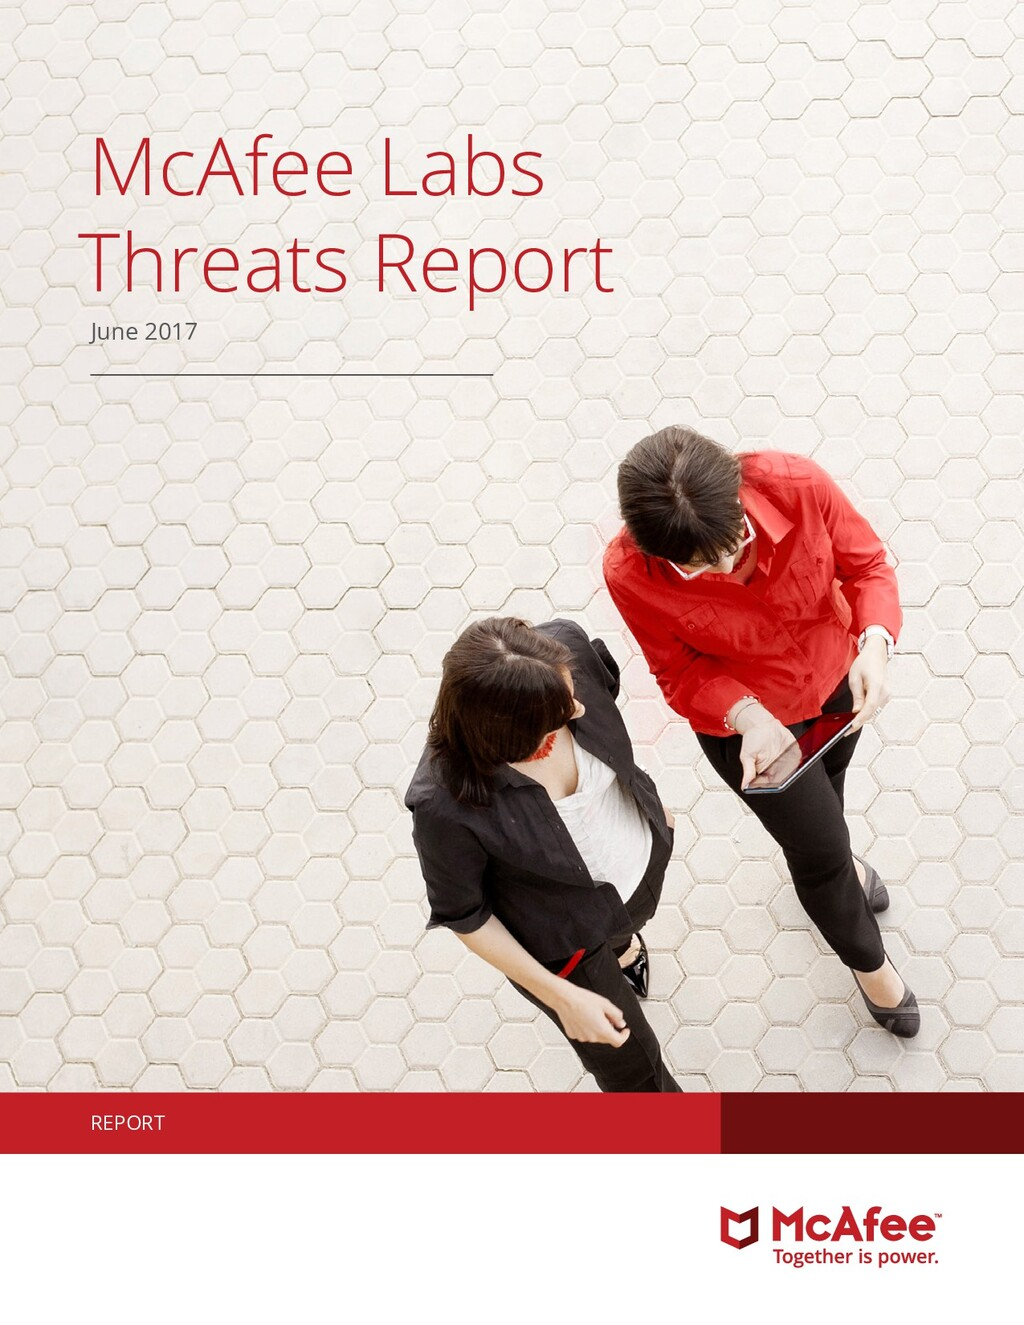 McAfee Labs Threats Report June 2017 REPORT